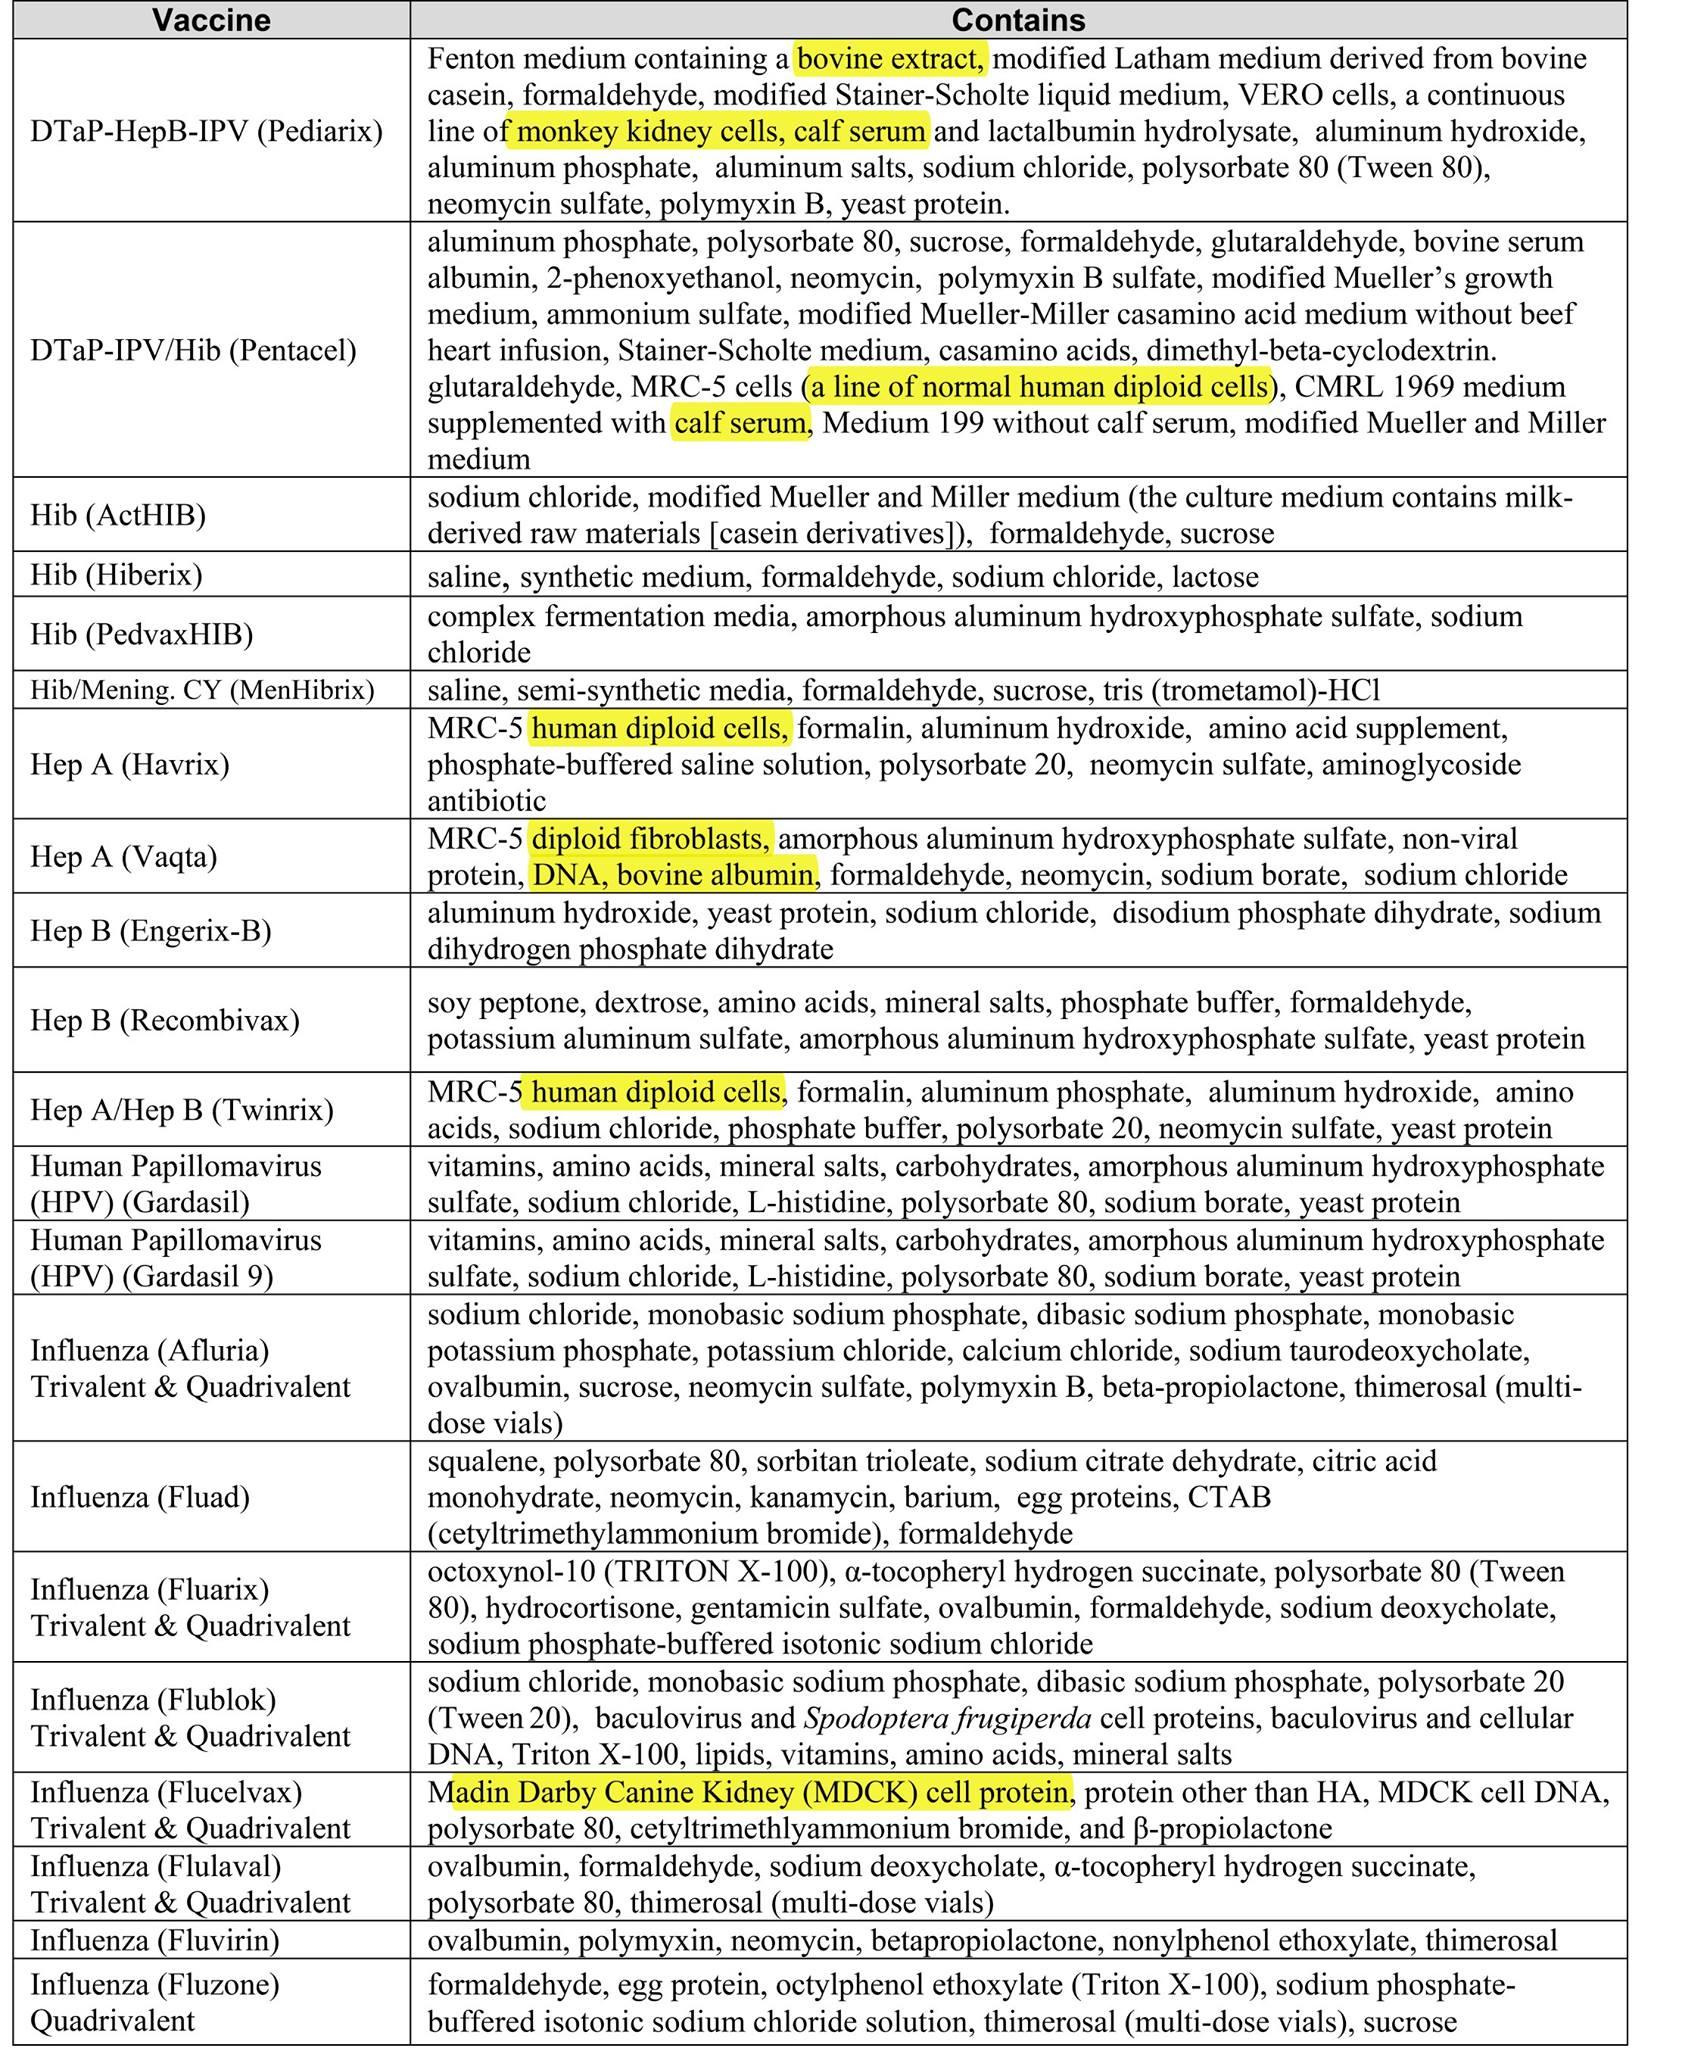 vaccine_stuff_p2.jpg